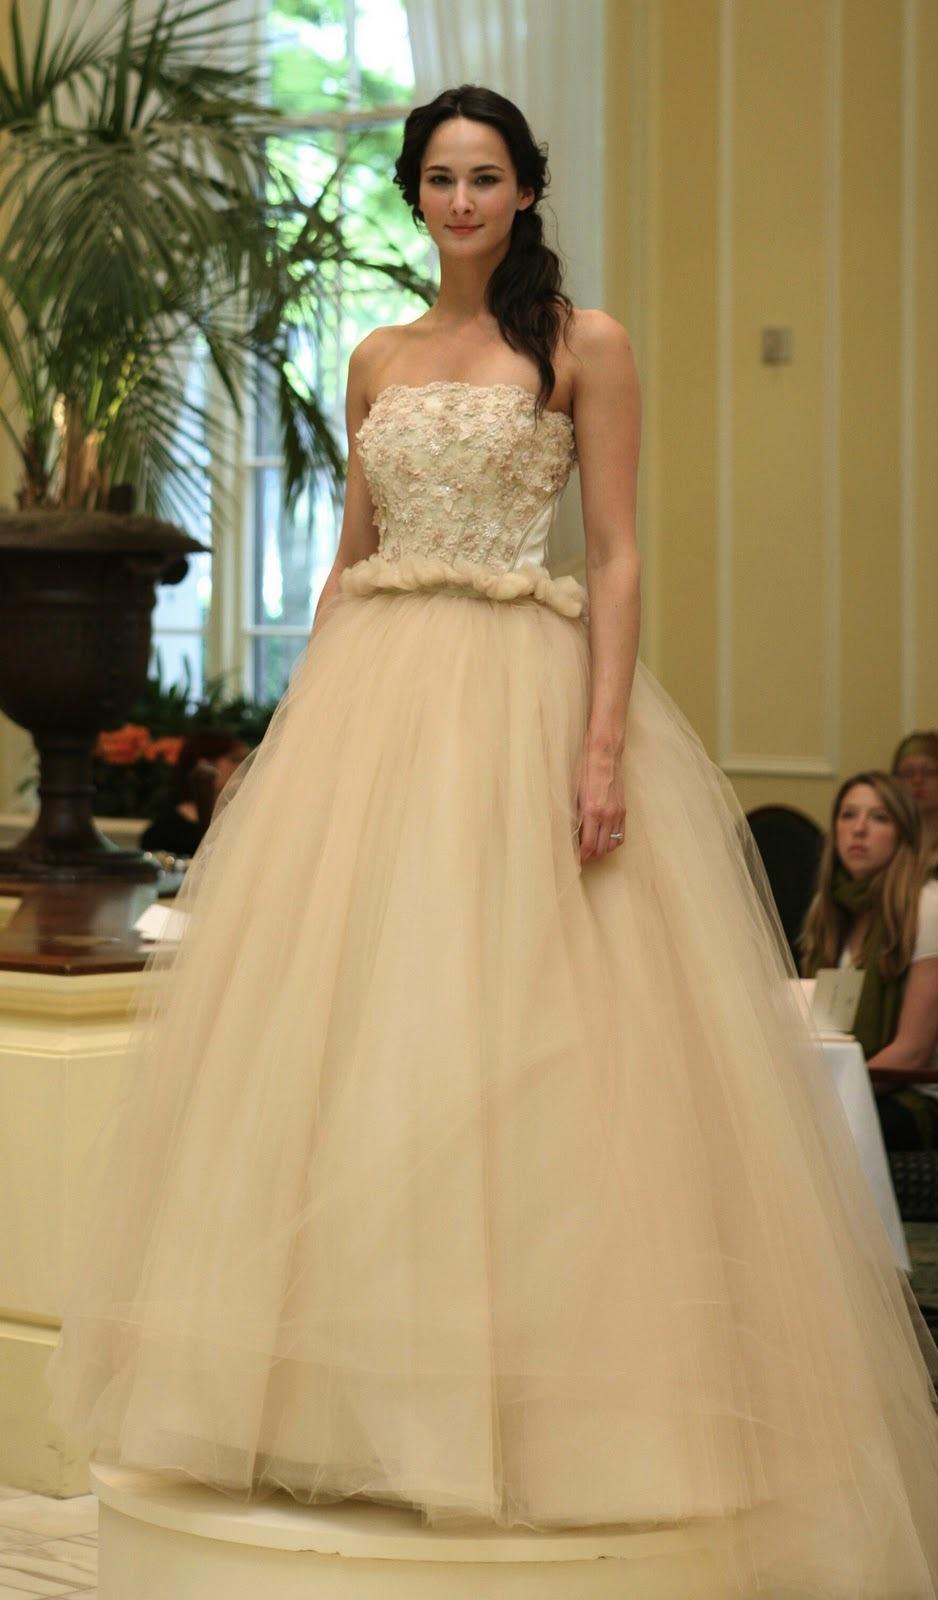 Beige-tulle-ballgown-wedding-dress.full